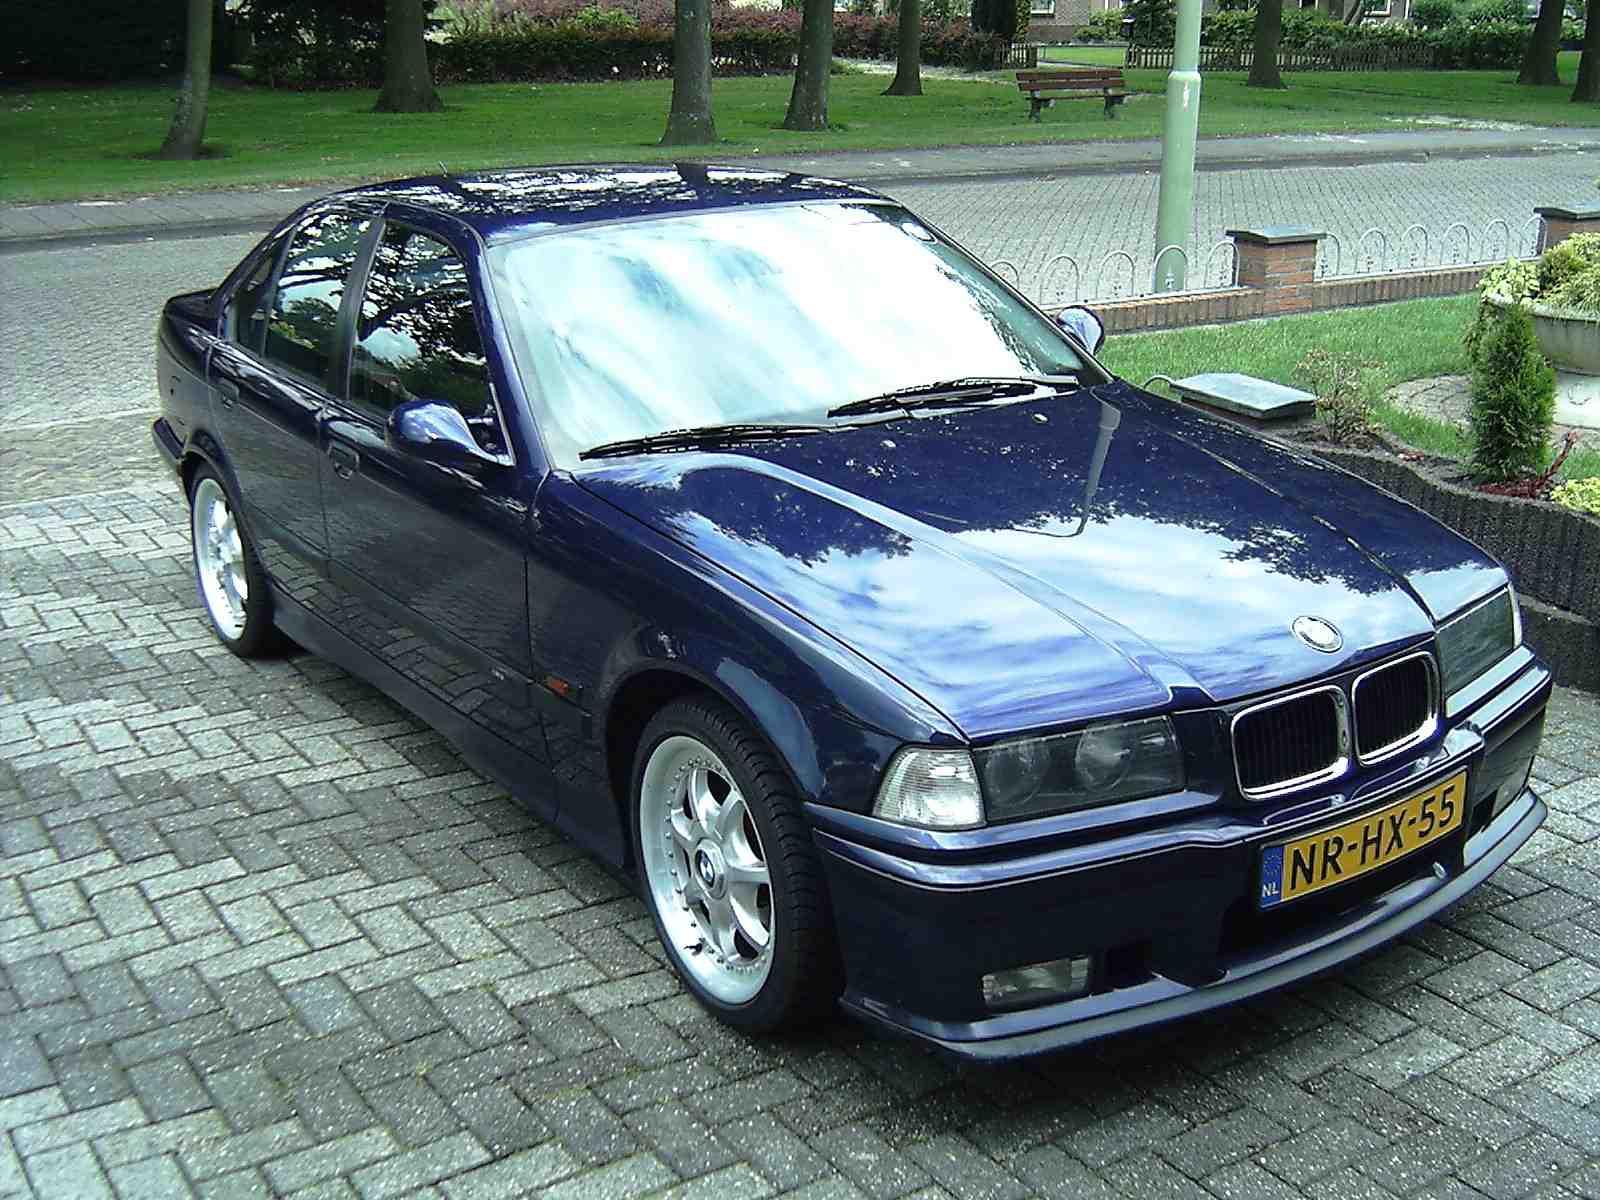 1992 1998 bmw 3 series e36 m3 318i 323i 325i 328i sedan coupe and convertible workshop. Black Bedroom Furniture Sets. Home Design Ideas